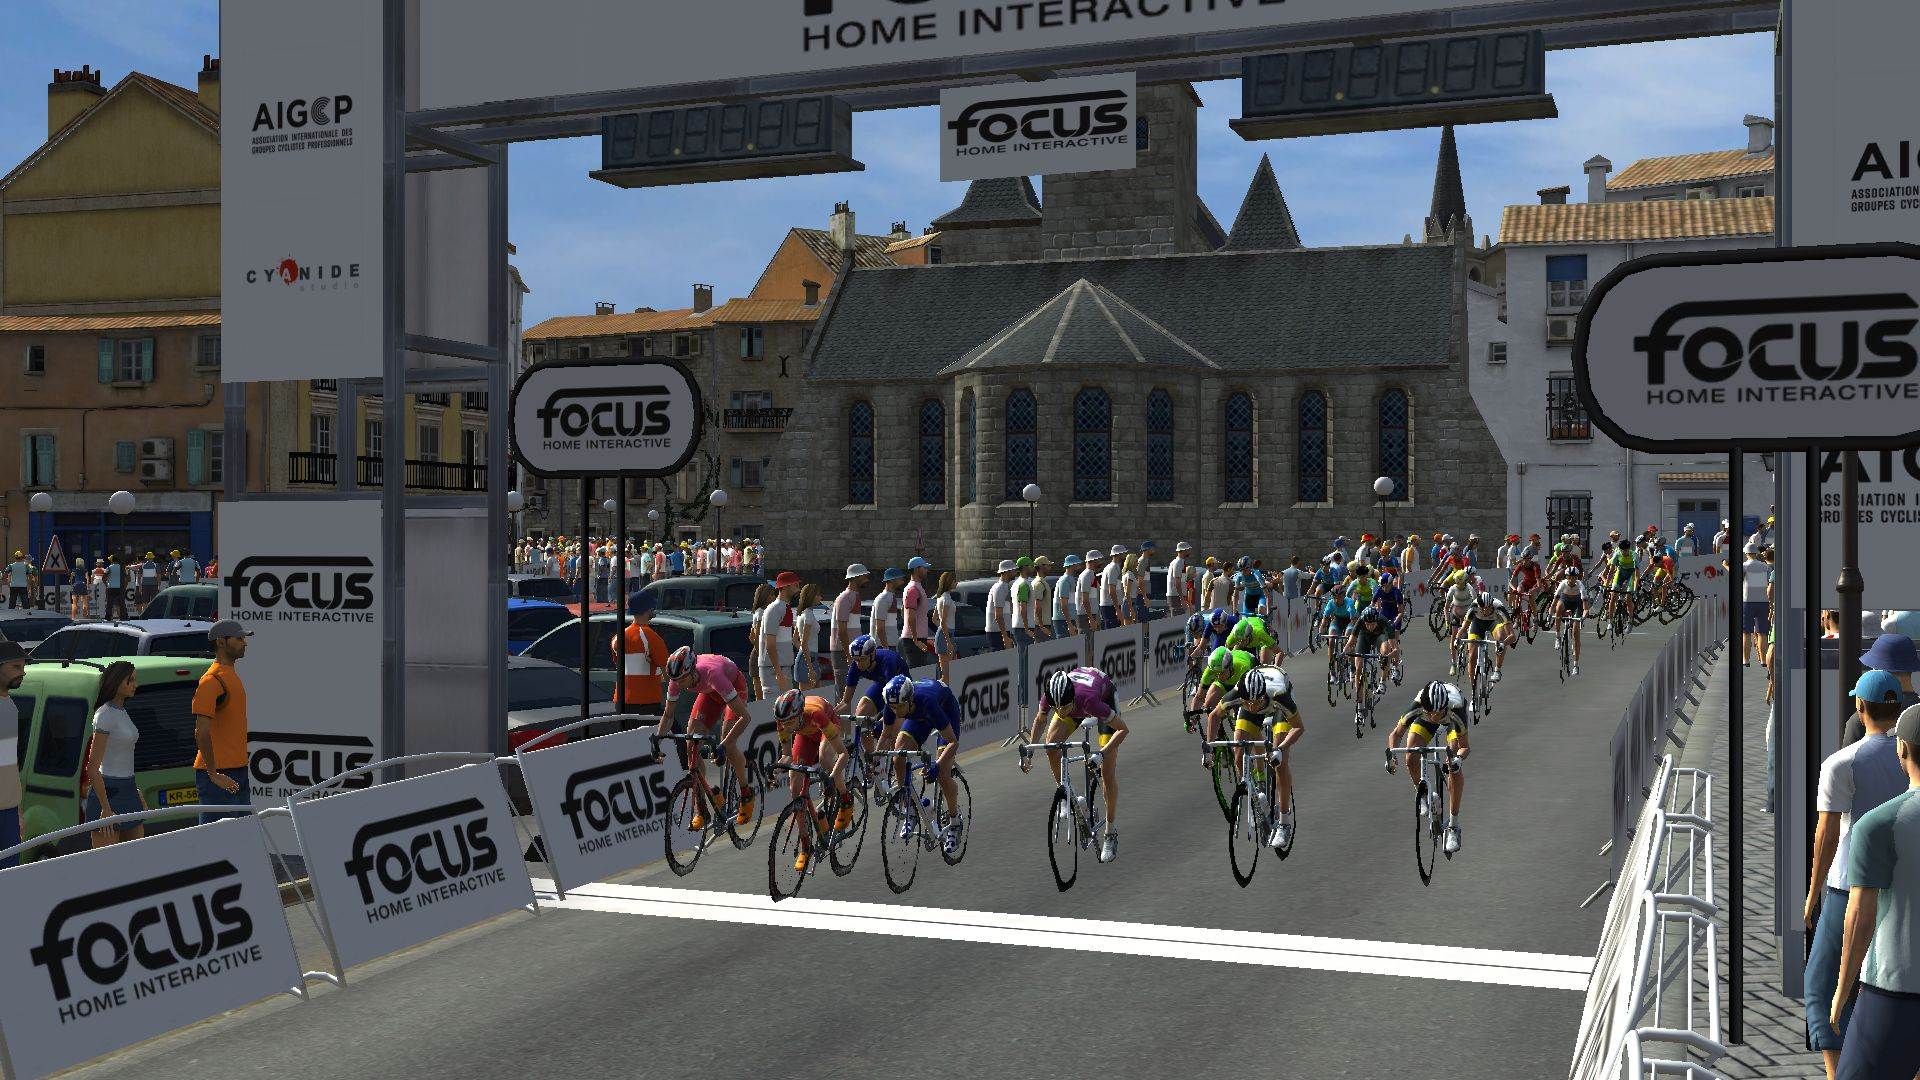 pcmdaily.com/images/mg/2019/Races/GTM/Giro/mg19_giro_12_PCM0152.jpg